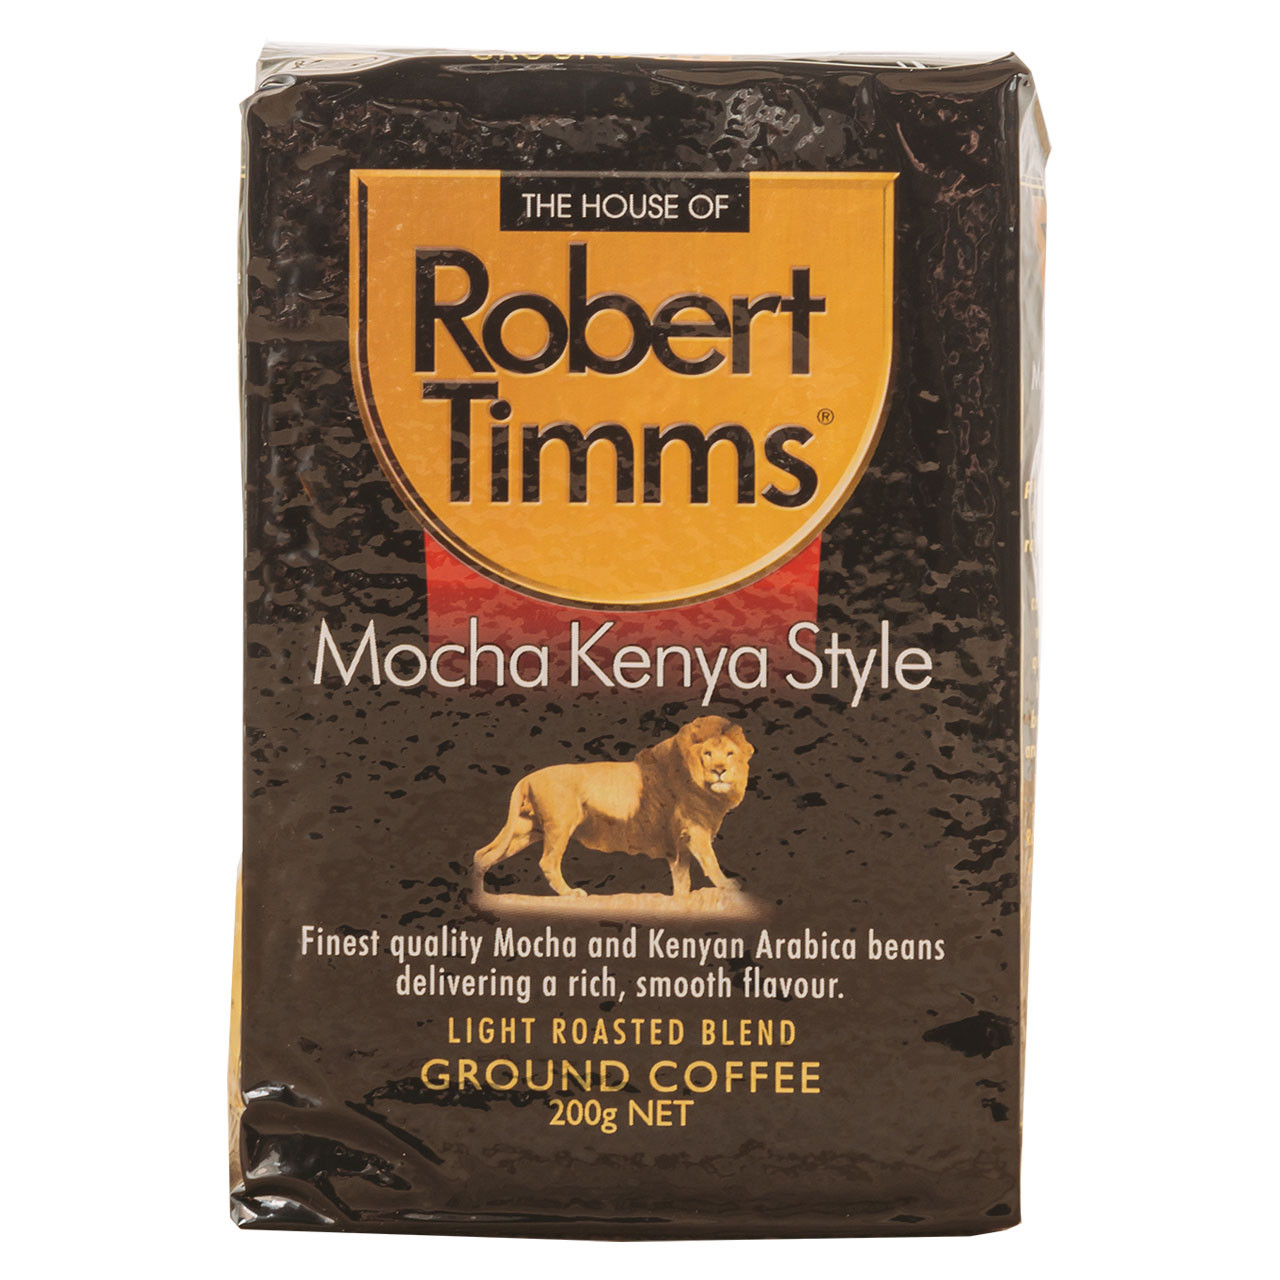 Mocha Kenya Ground Coffee